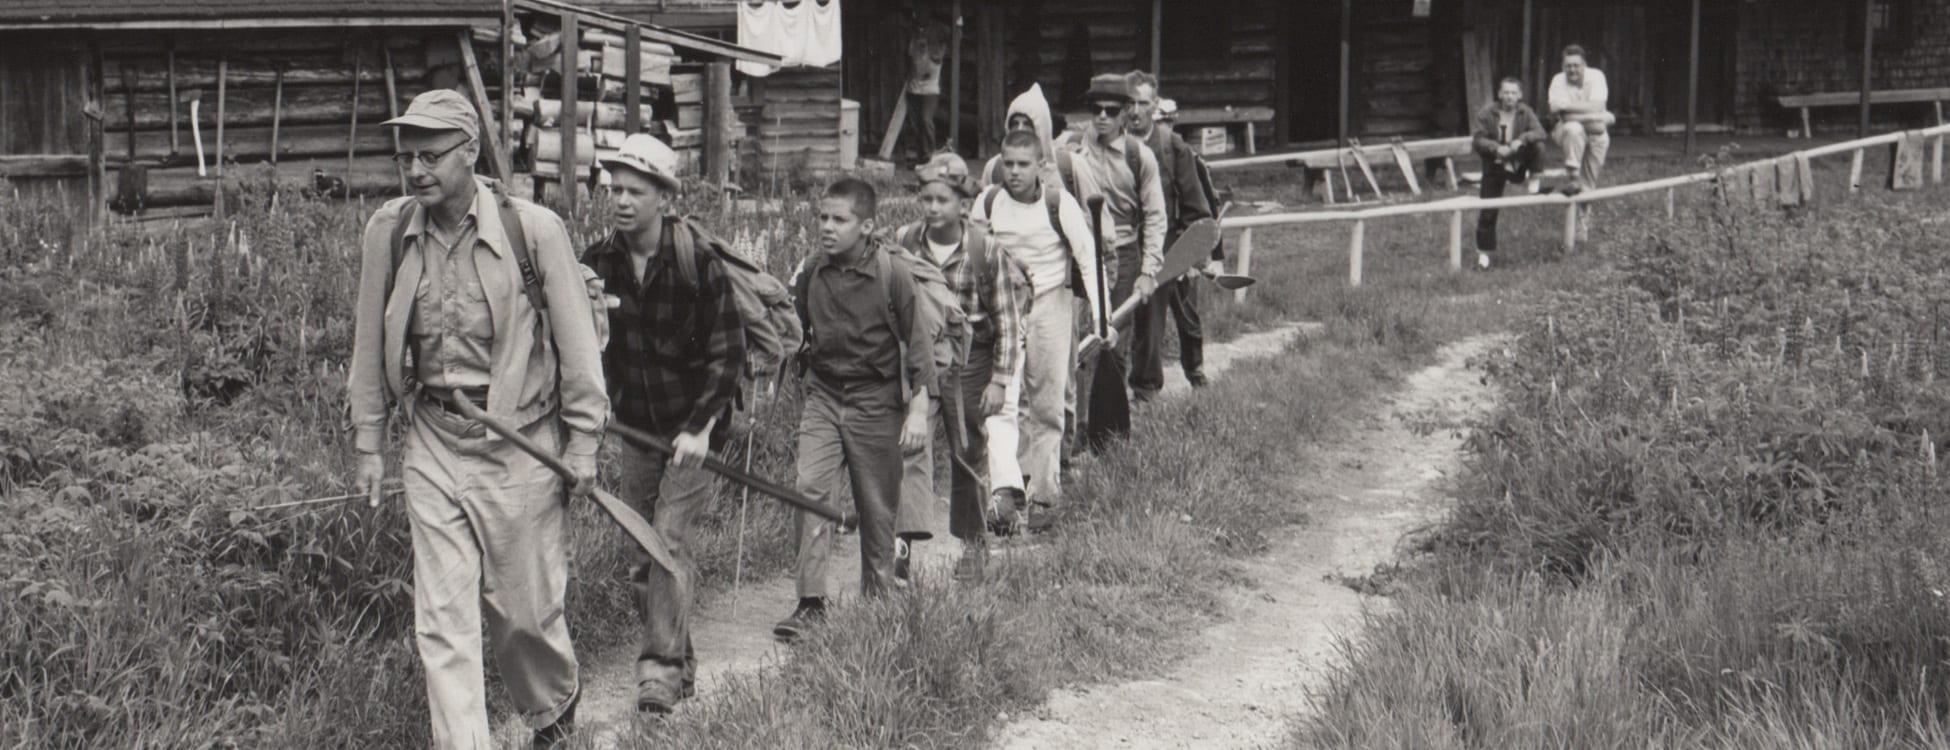 hikers at camp